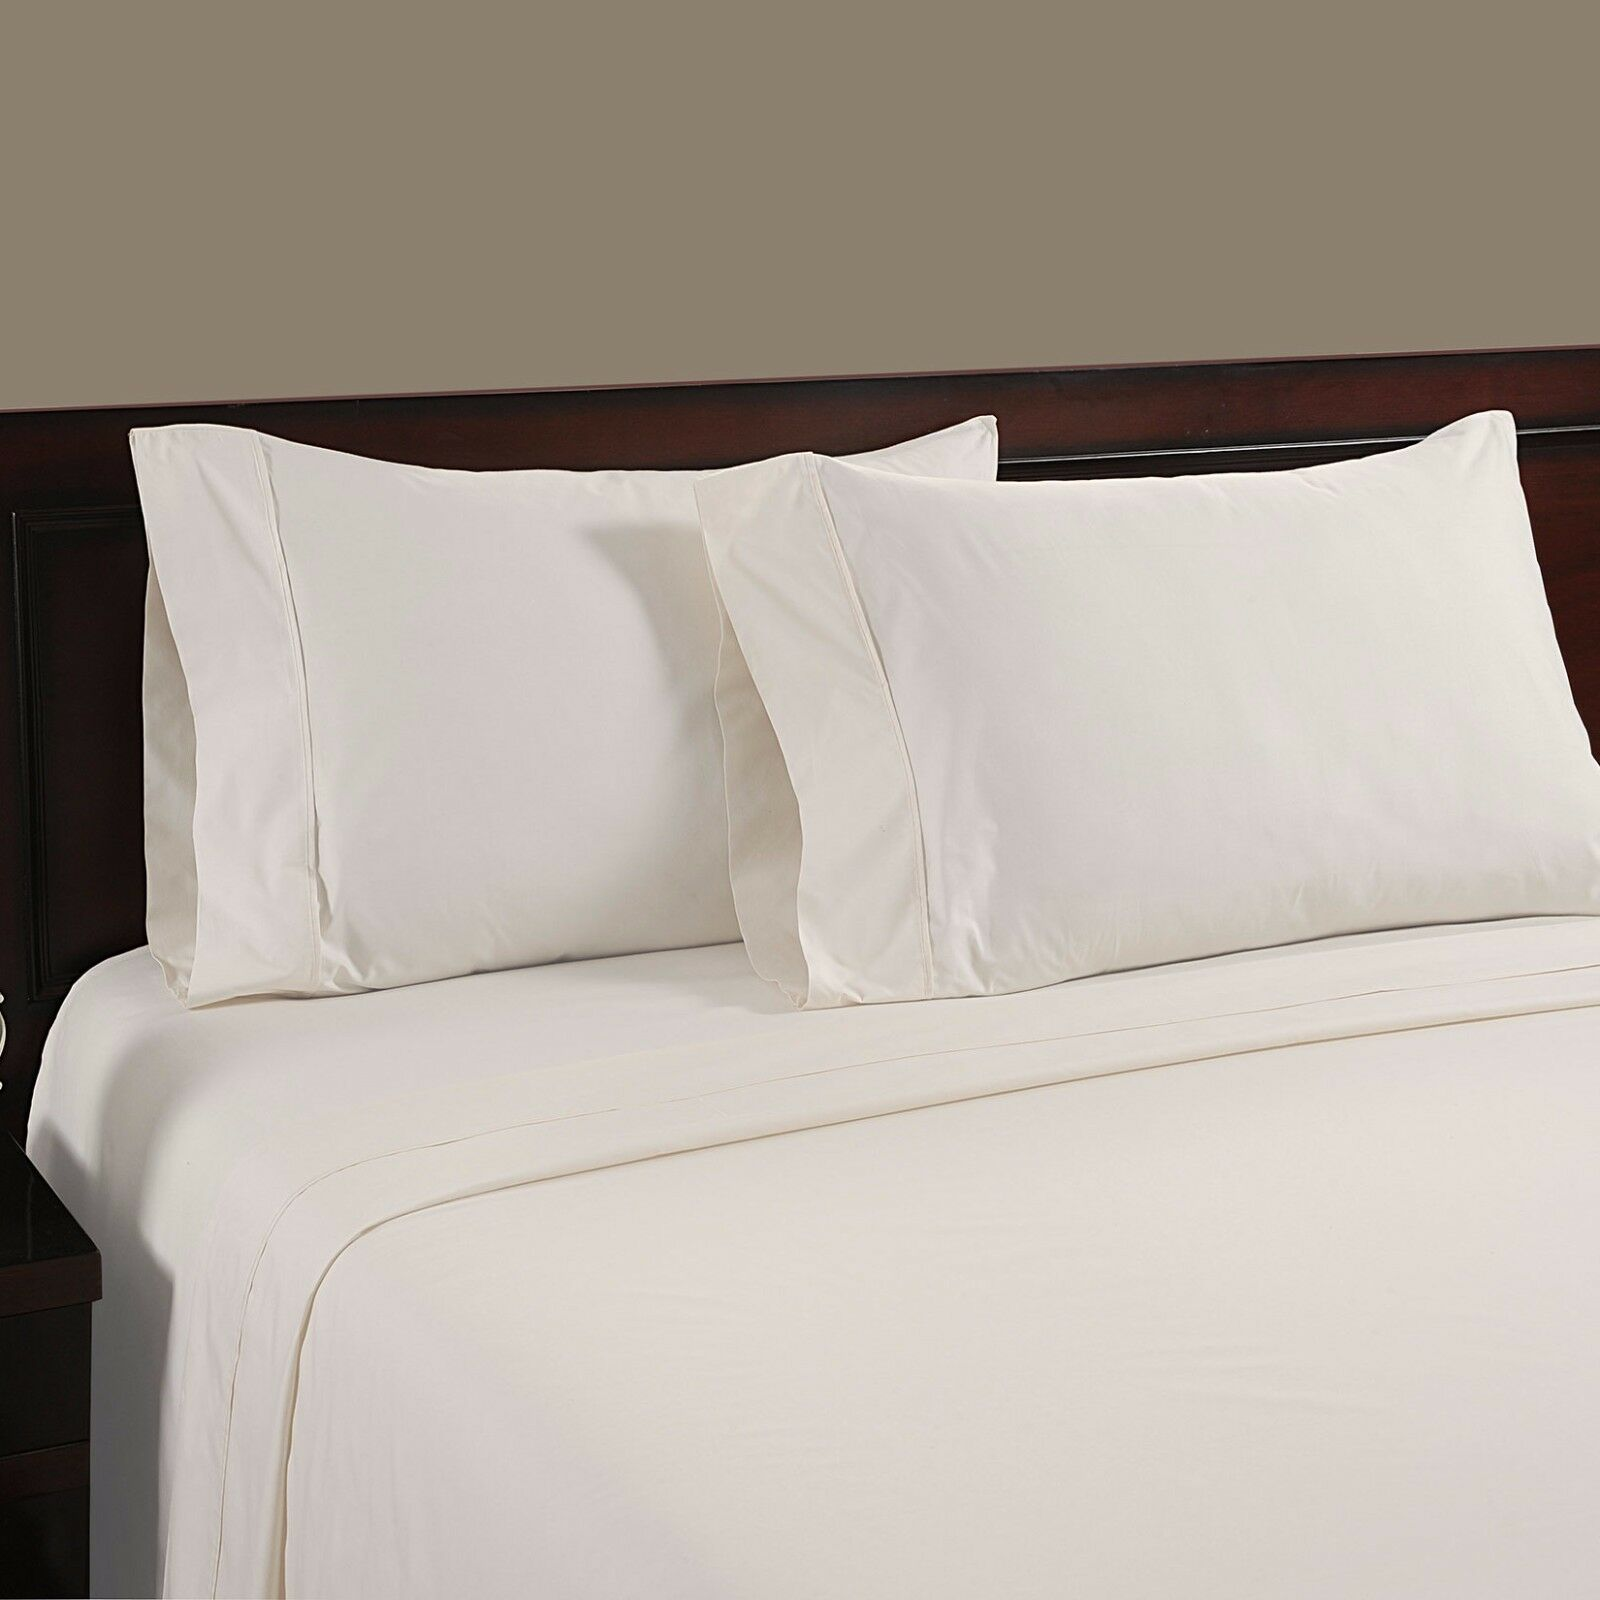 500 Thread Count 100% American Pima Cotton Satin Duvet Covers